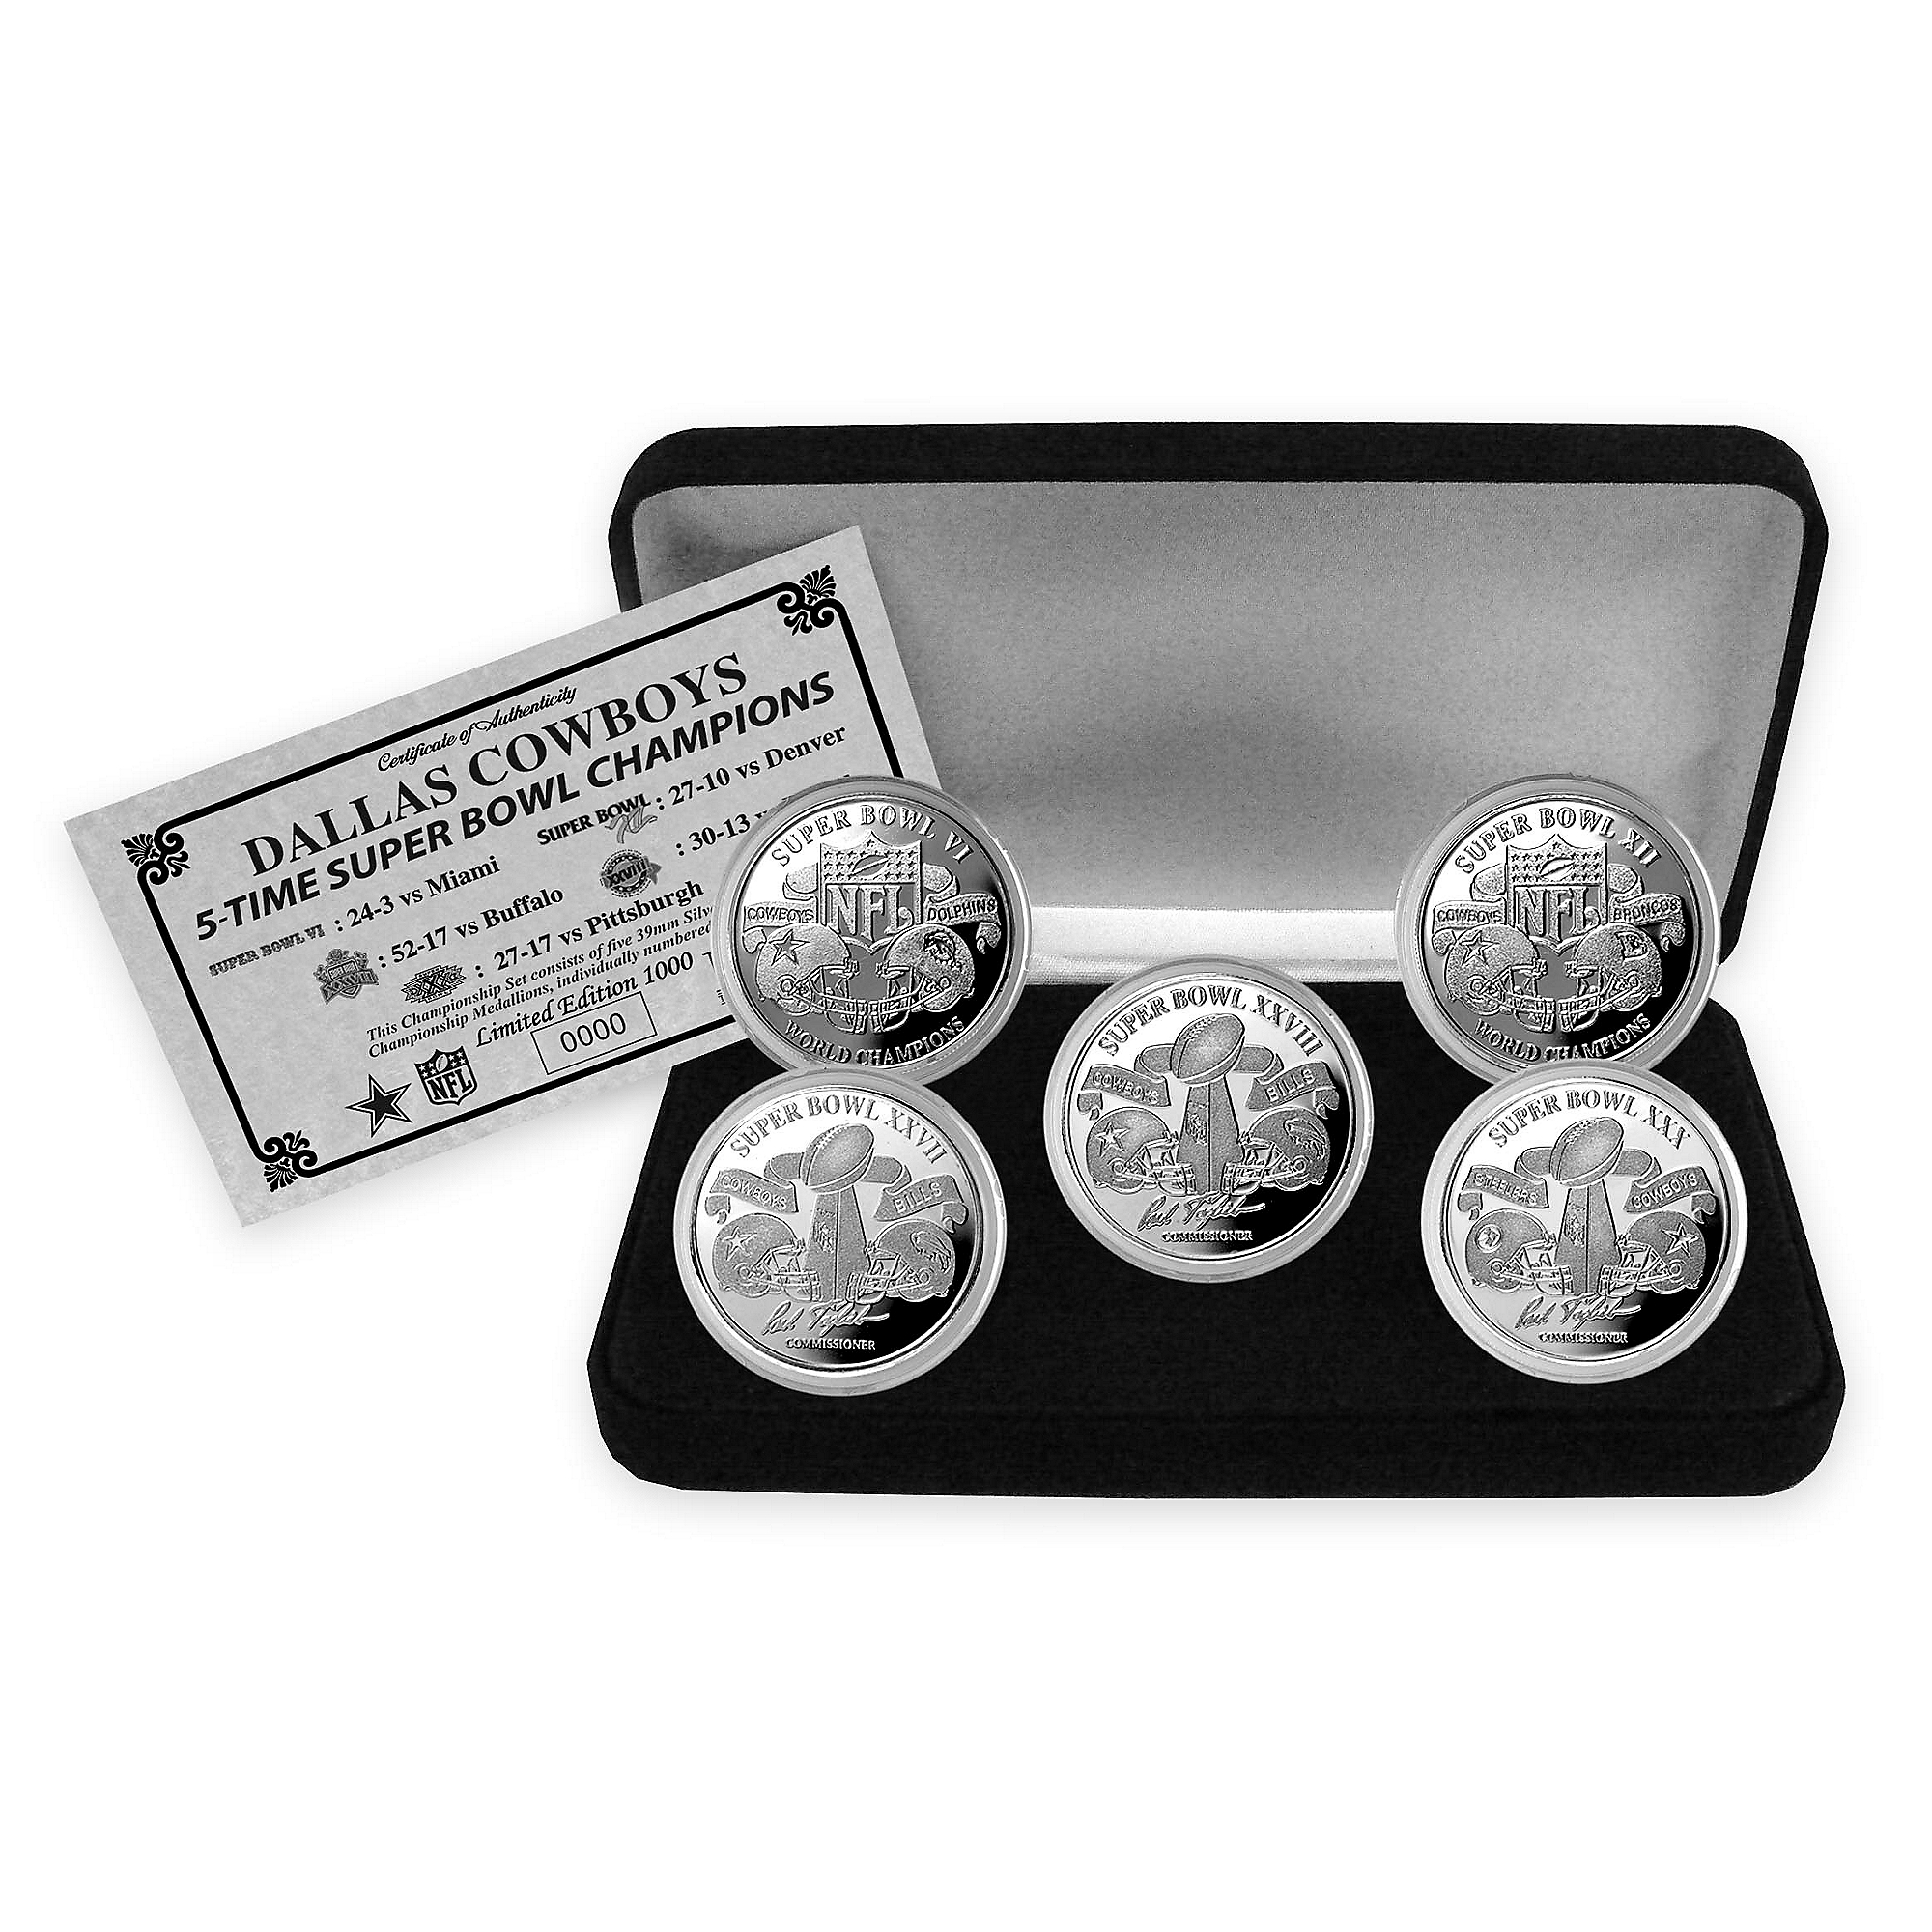 Dallas Cowboys Super Bowl Champs 5 Silver Game Coin Set